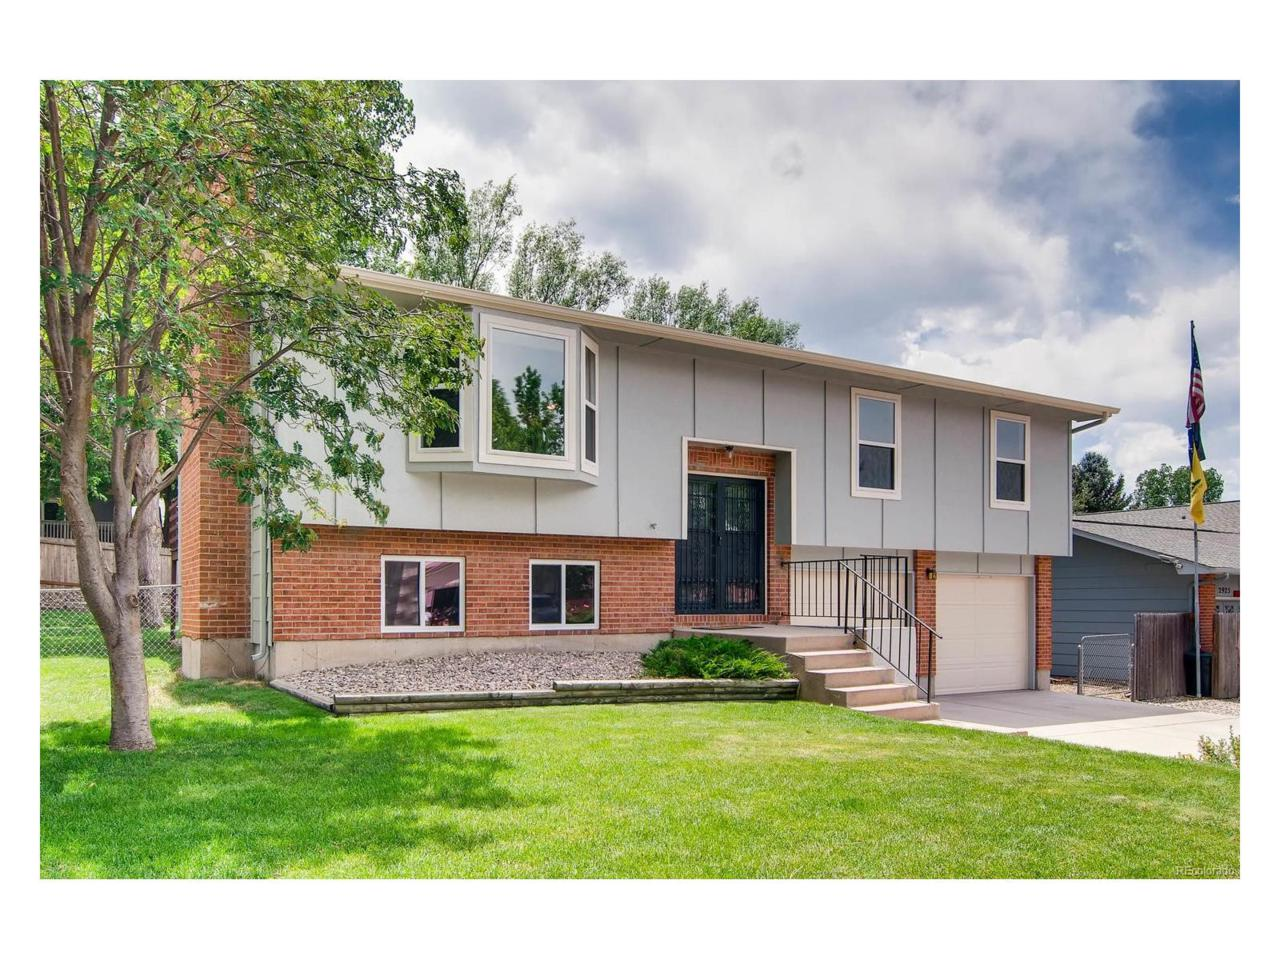 2935 Purgatory Drive, Colorado Springs, CO 80918 (MLS #3081877) :: 8z Real Estate